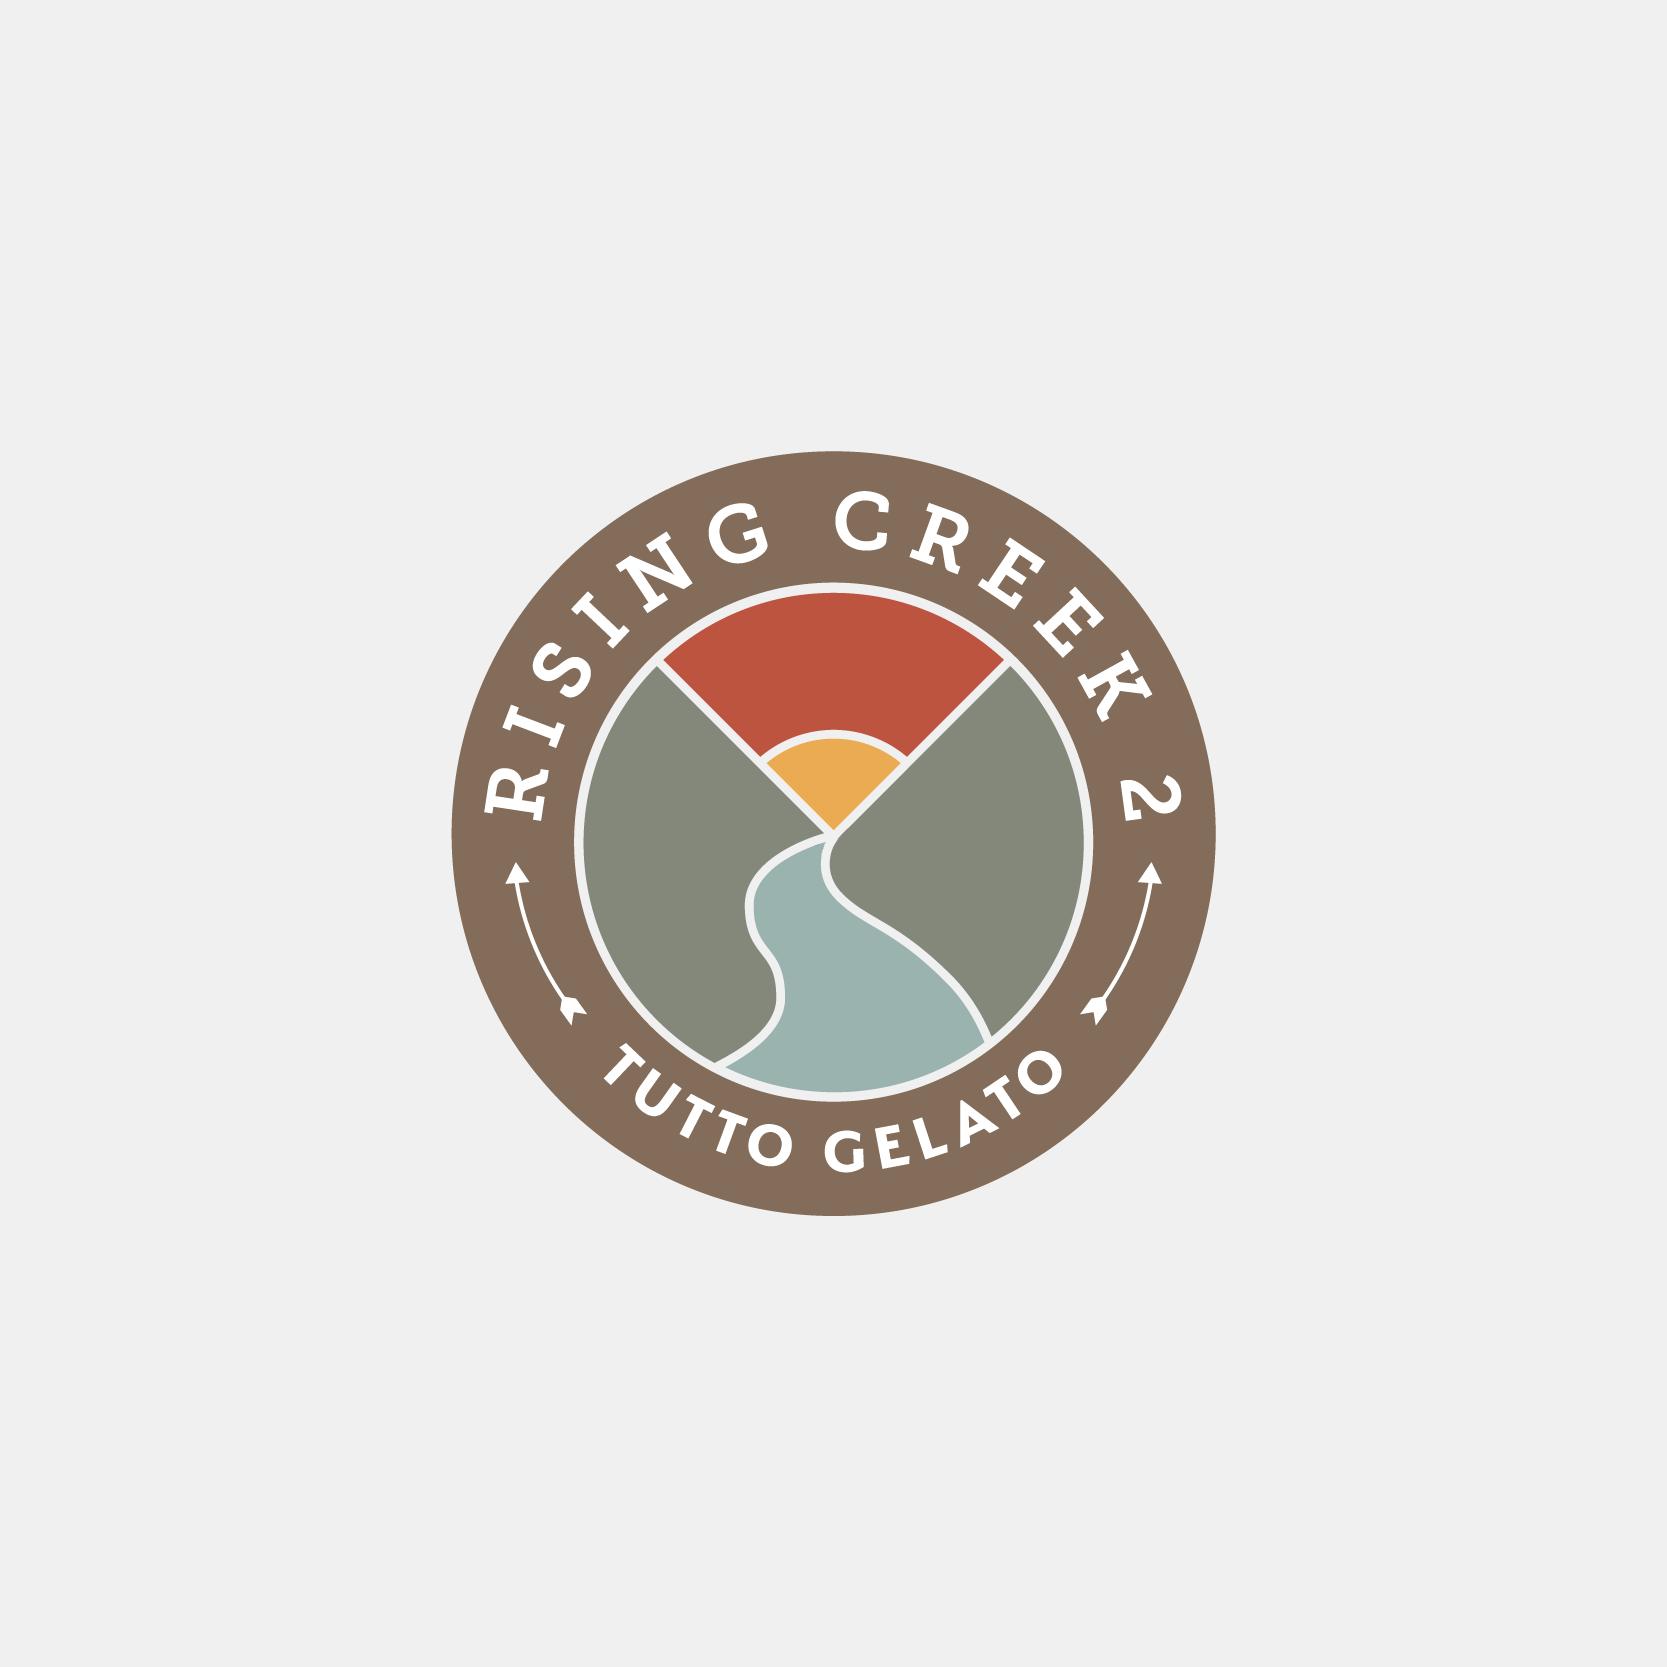 Rising Creek 2 Logo